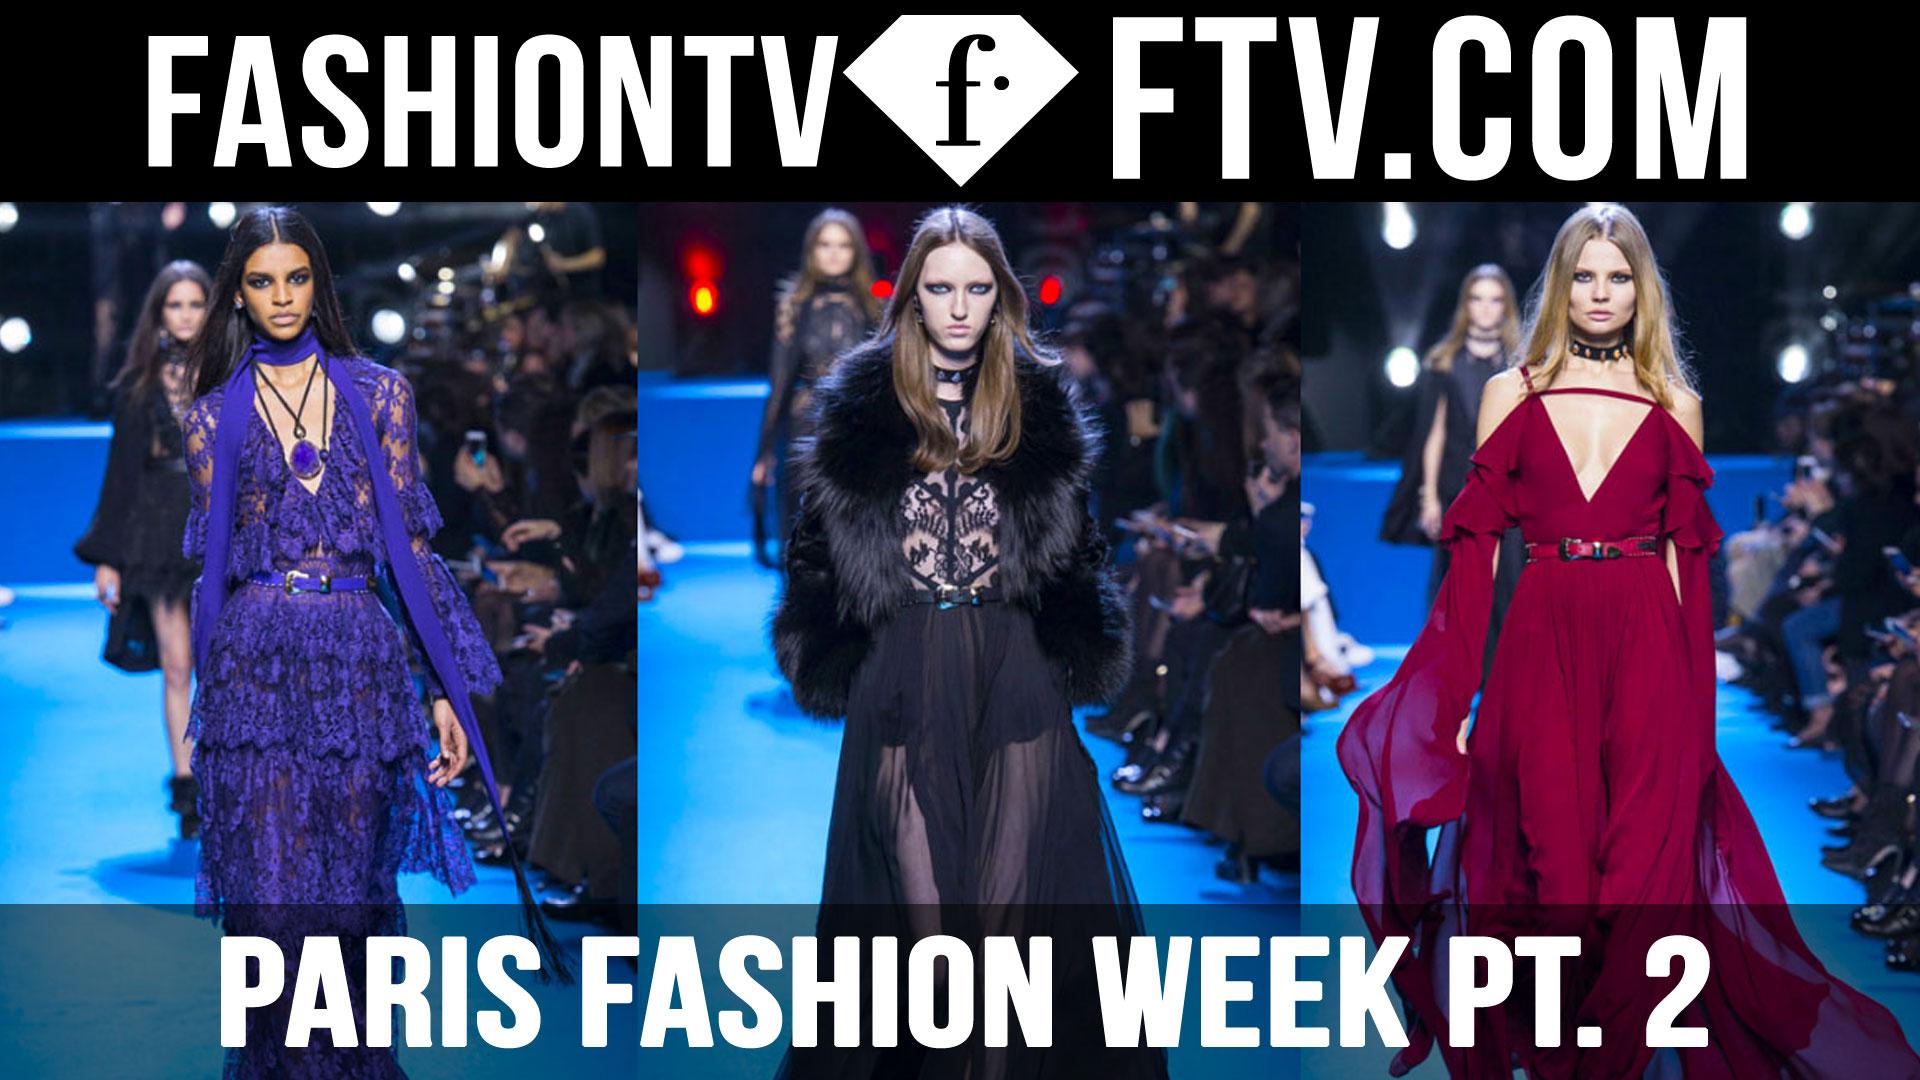 Paris Fashion Week Fall/Winter 2016-17 pt. 2   FTV.com